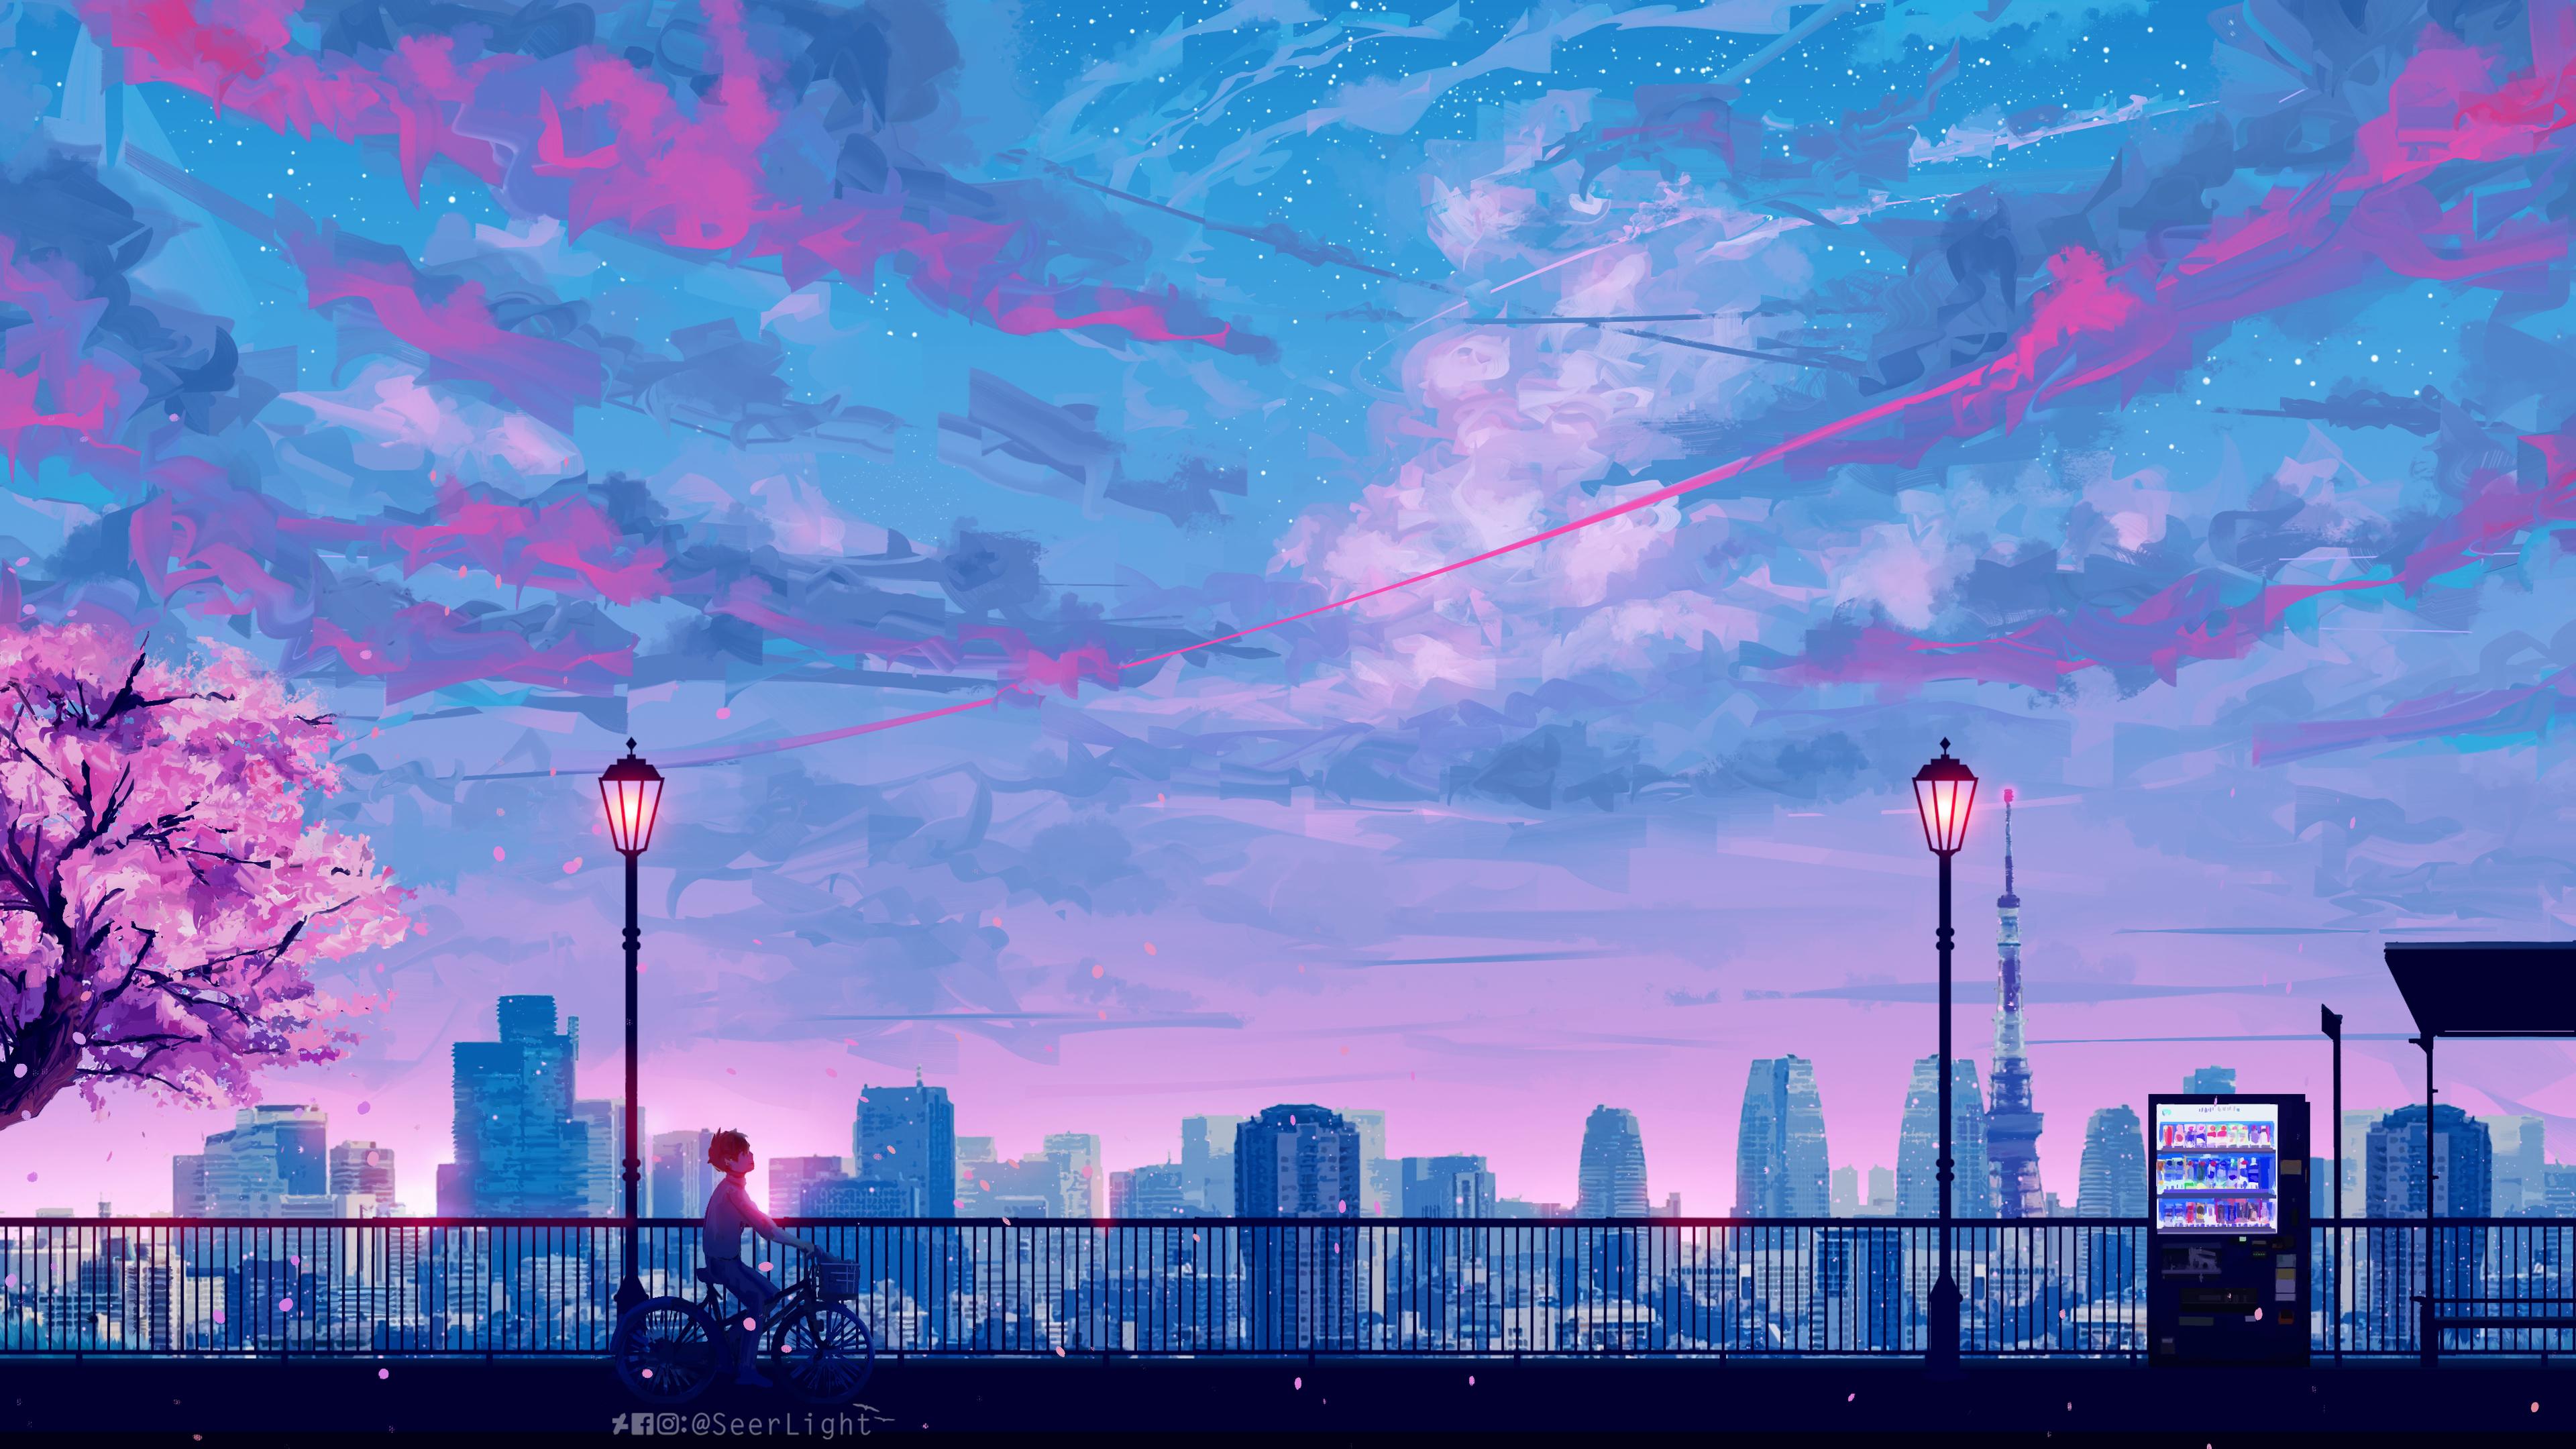 Unduh 85 Background Anime Wallpaper Hd HD Terbaru